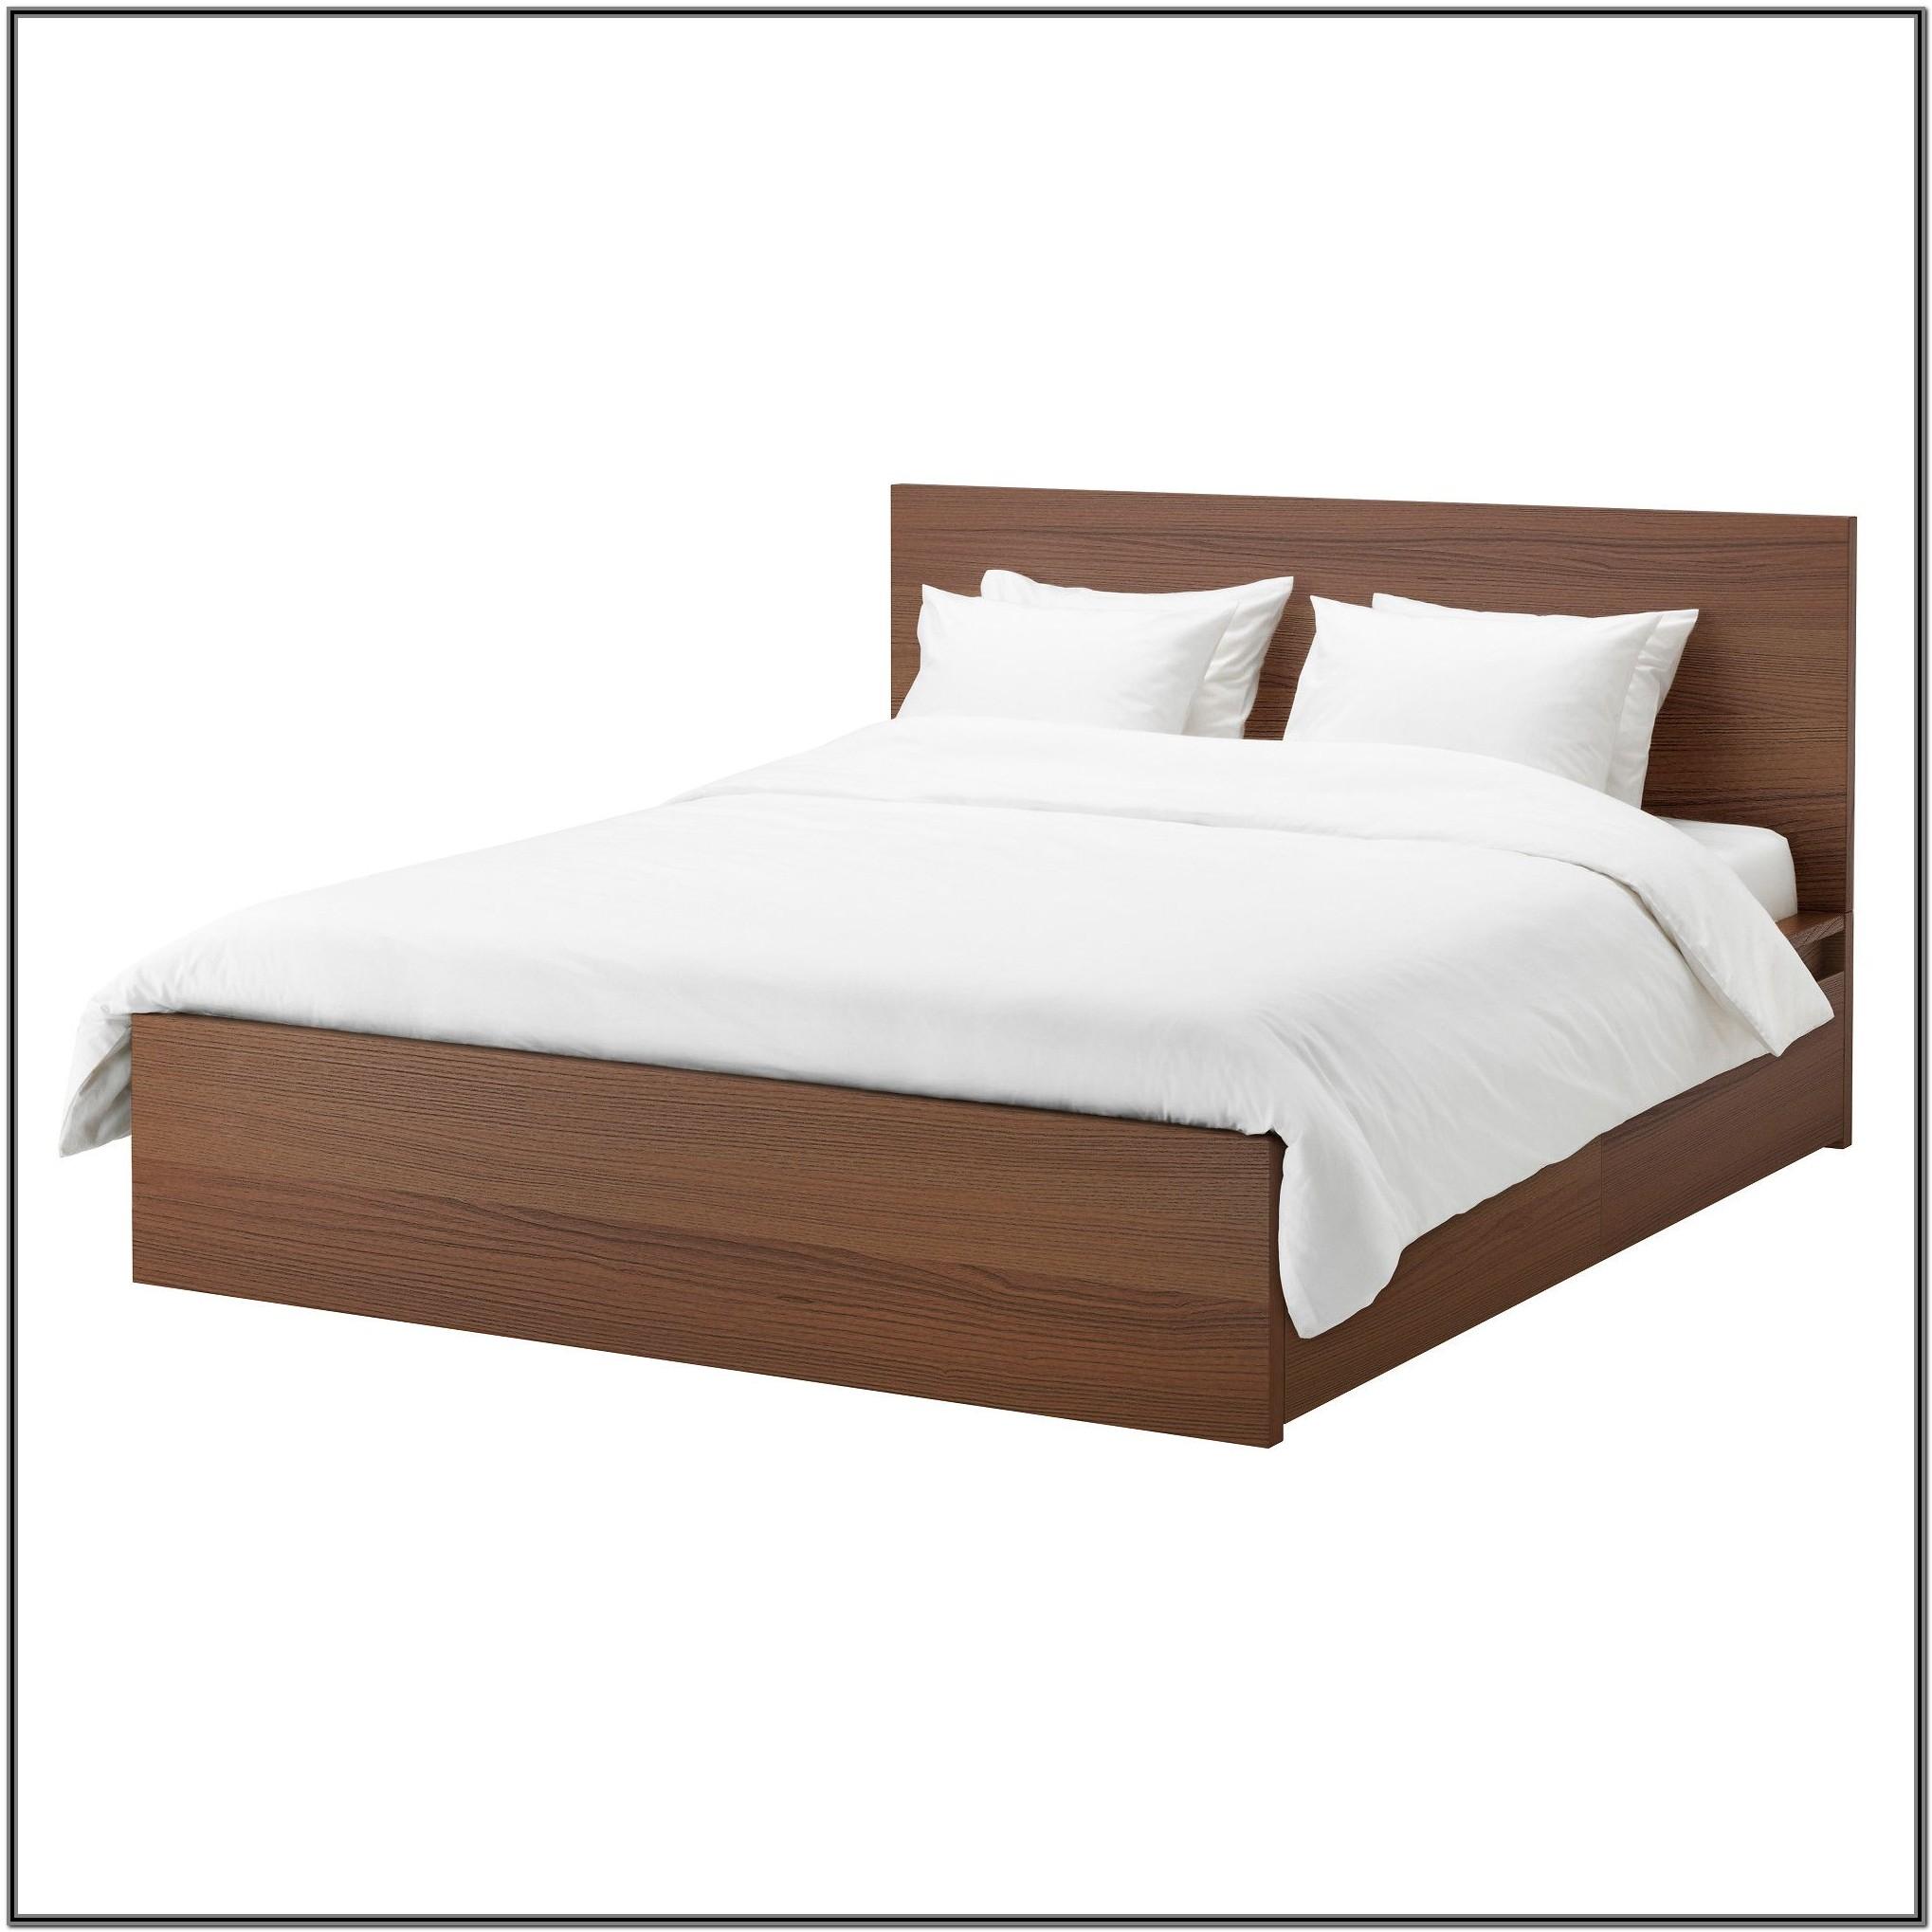 Ikea Malm King Size Bed Frame White